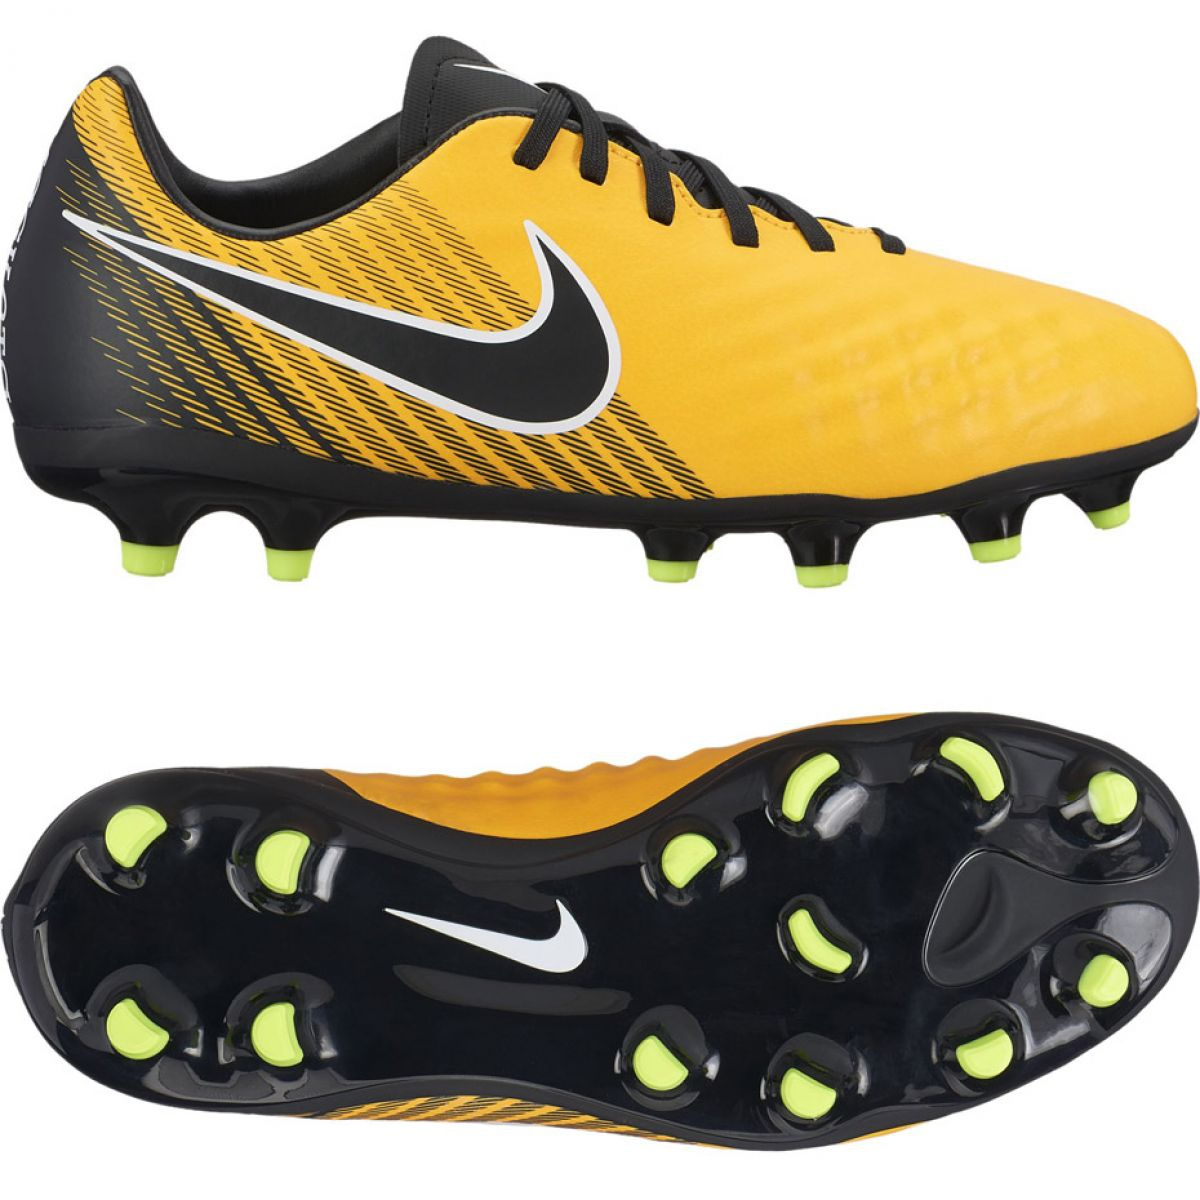 Legjobb Nike Férfi Futballcipő Nike Magista Onda II (FG)